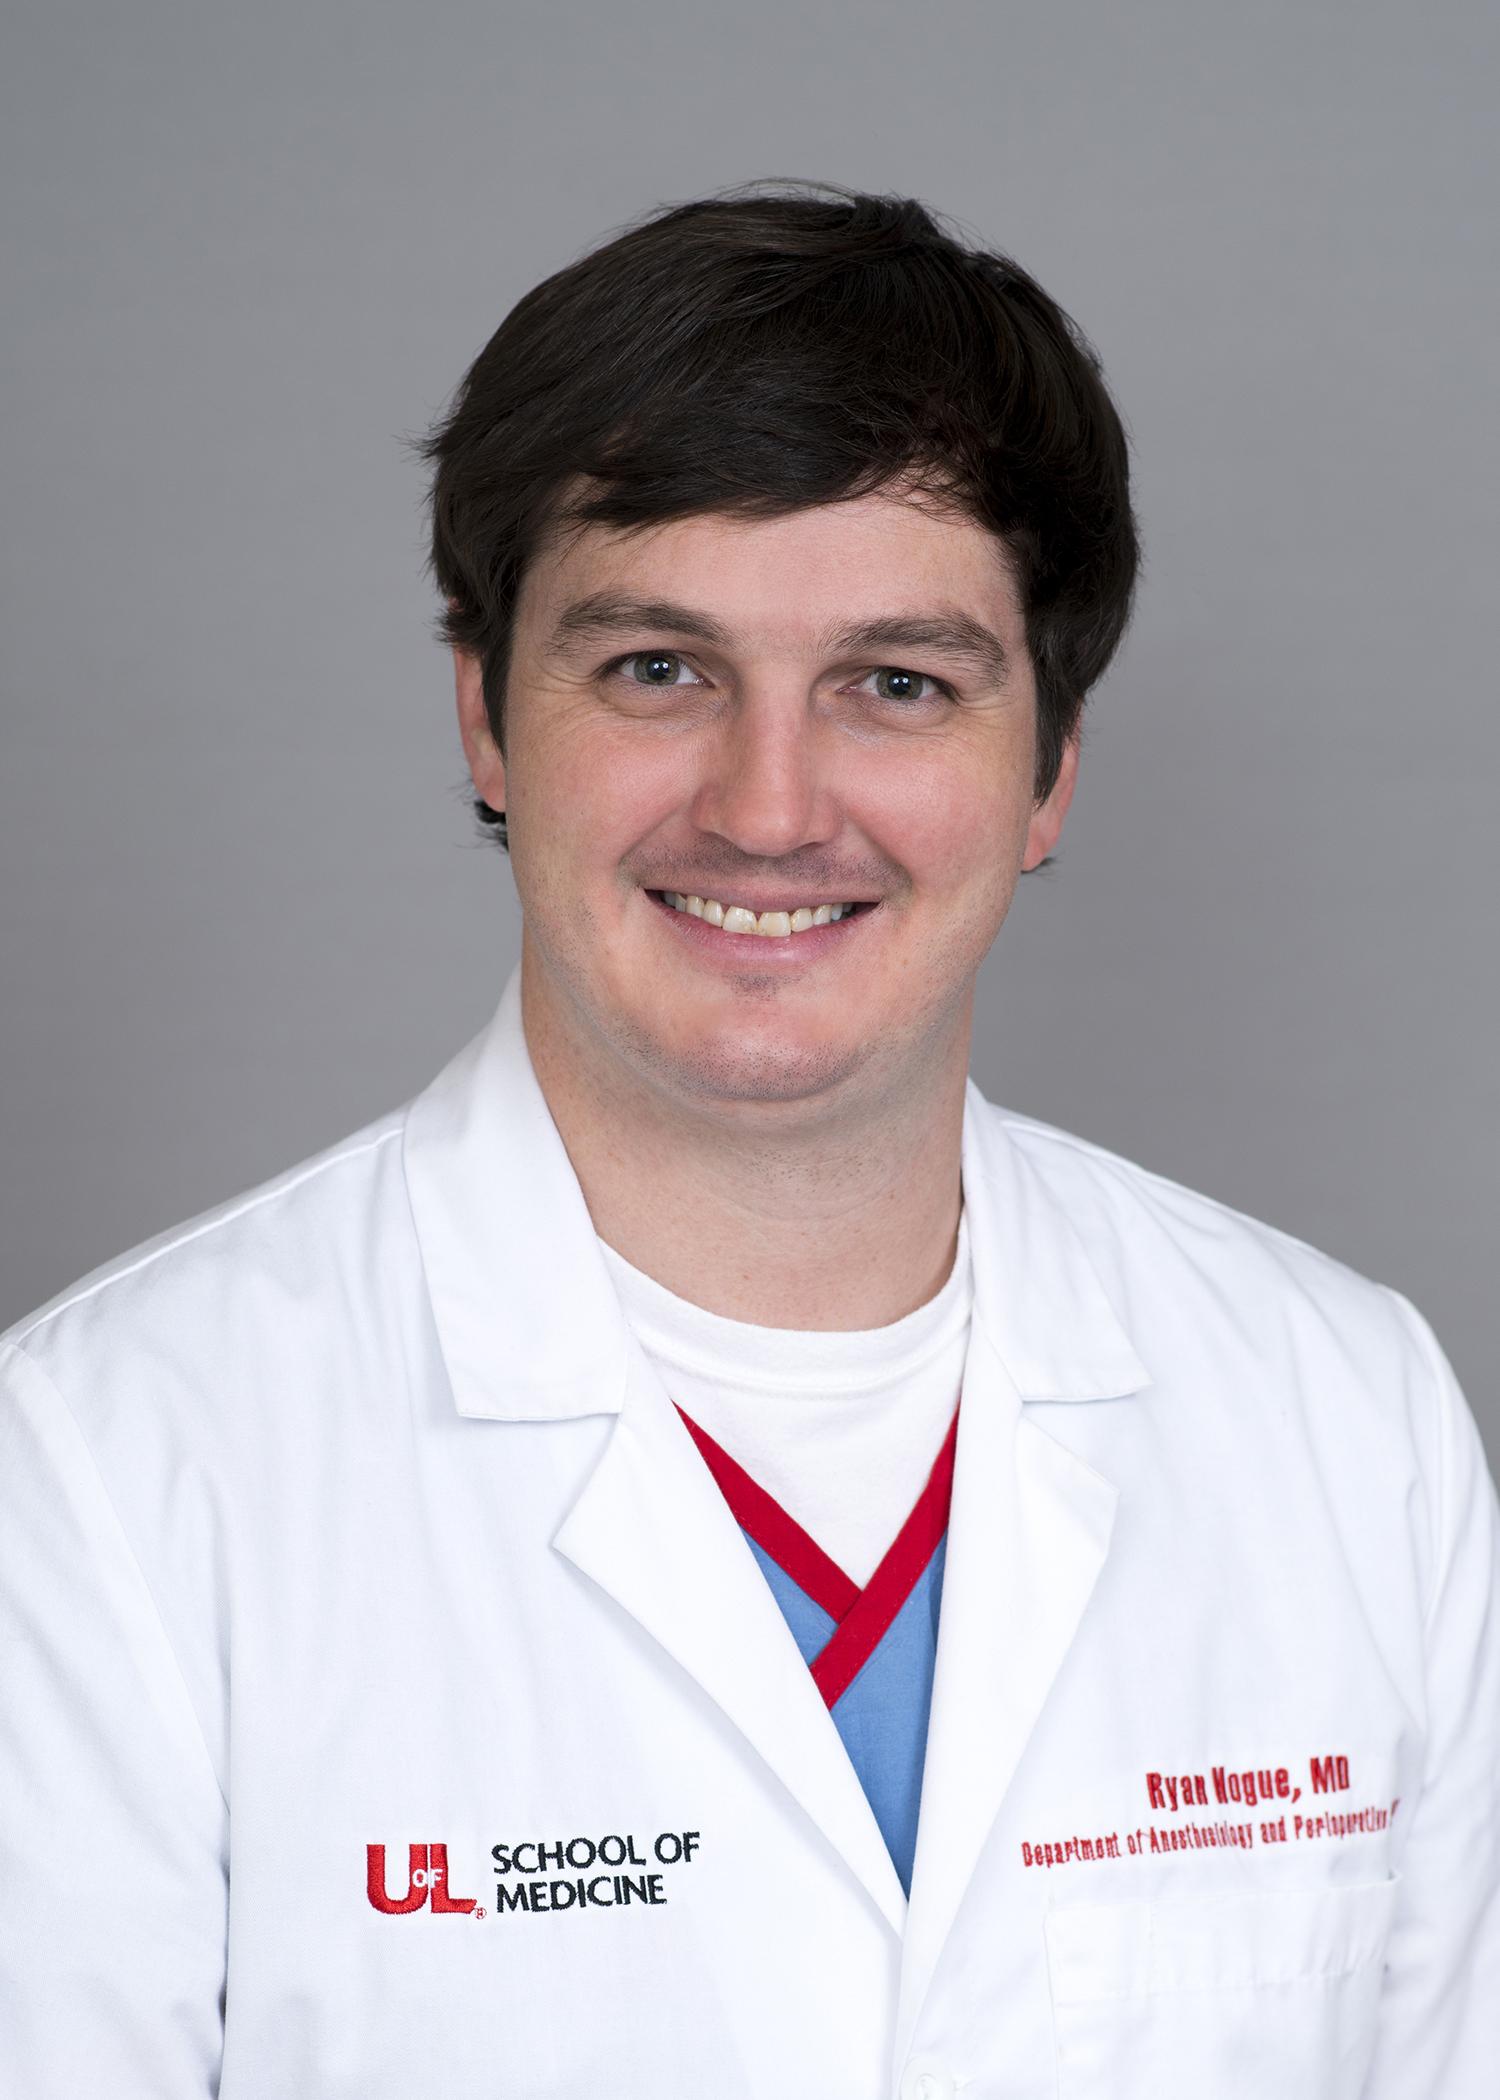 Dr. Ryan Hogue